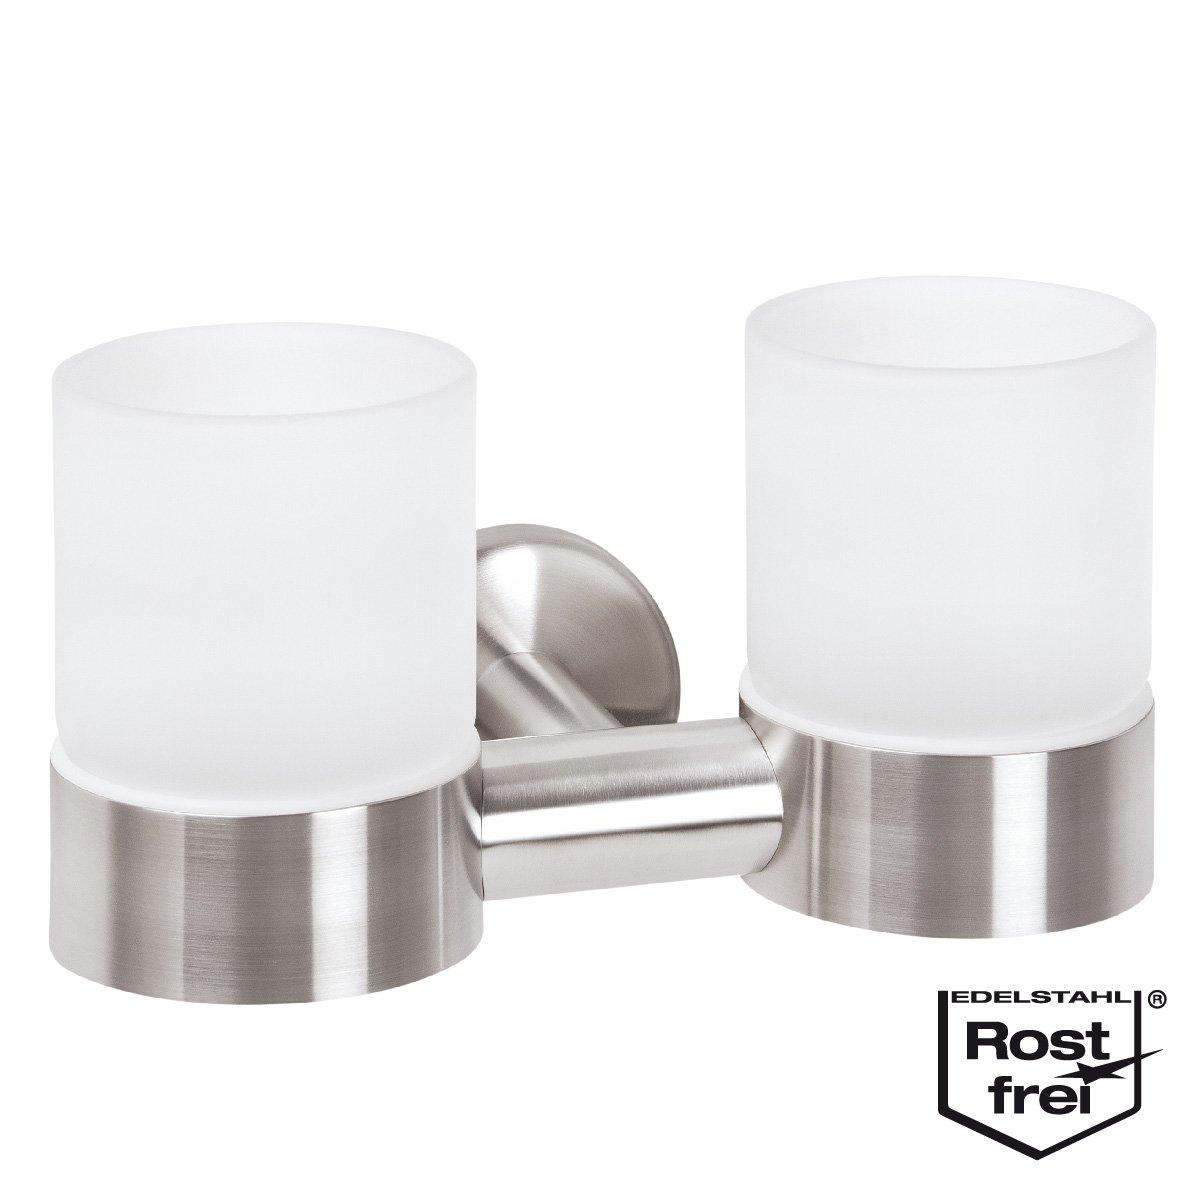 bremermann® PIAZZA Bathroom Range - Double Glass Holder, stainless steel 9428